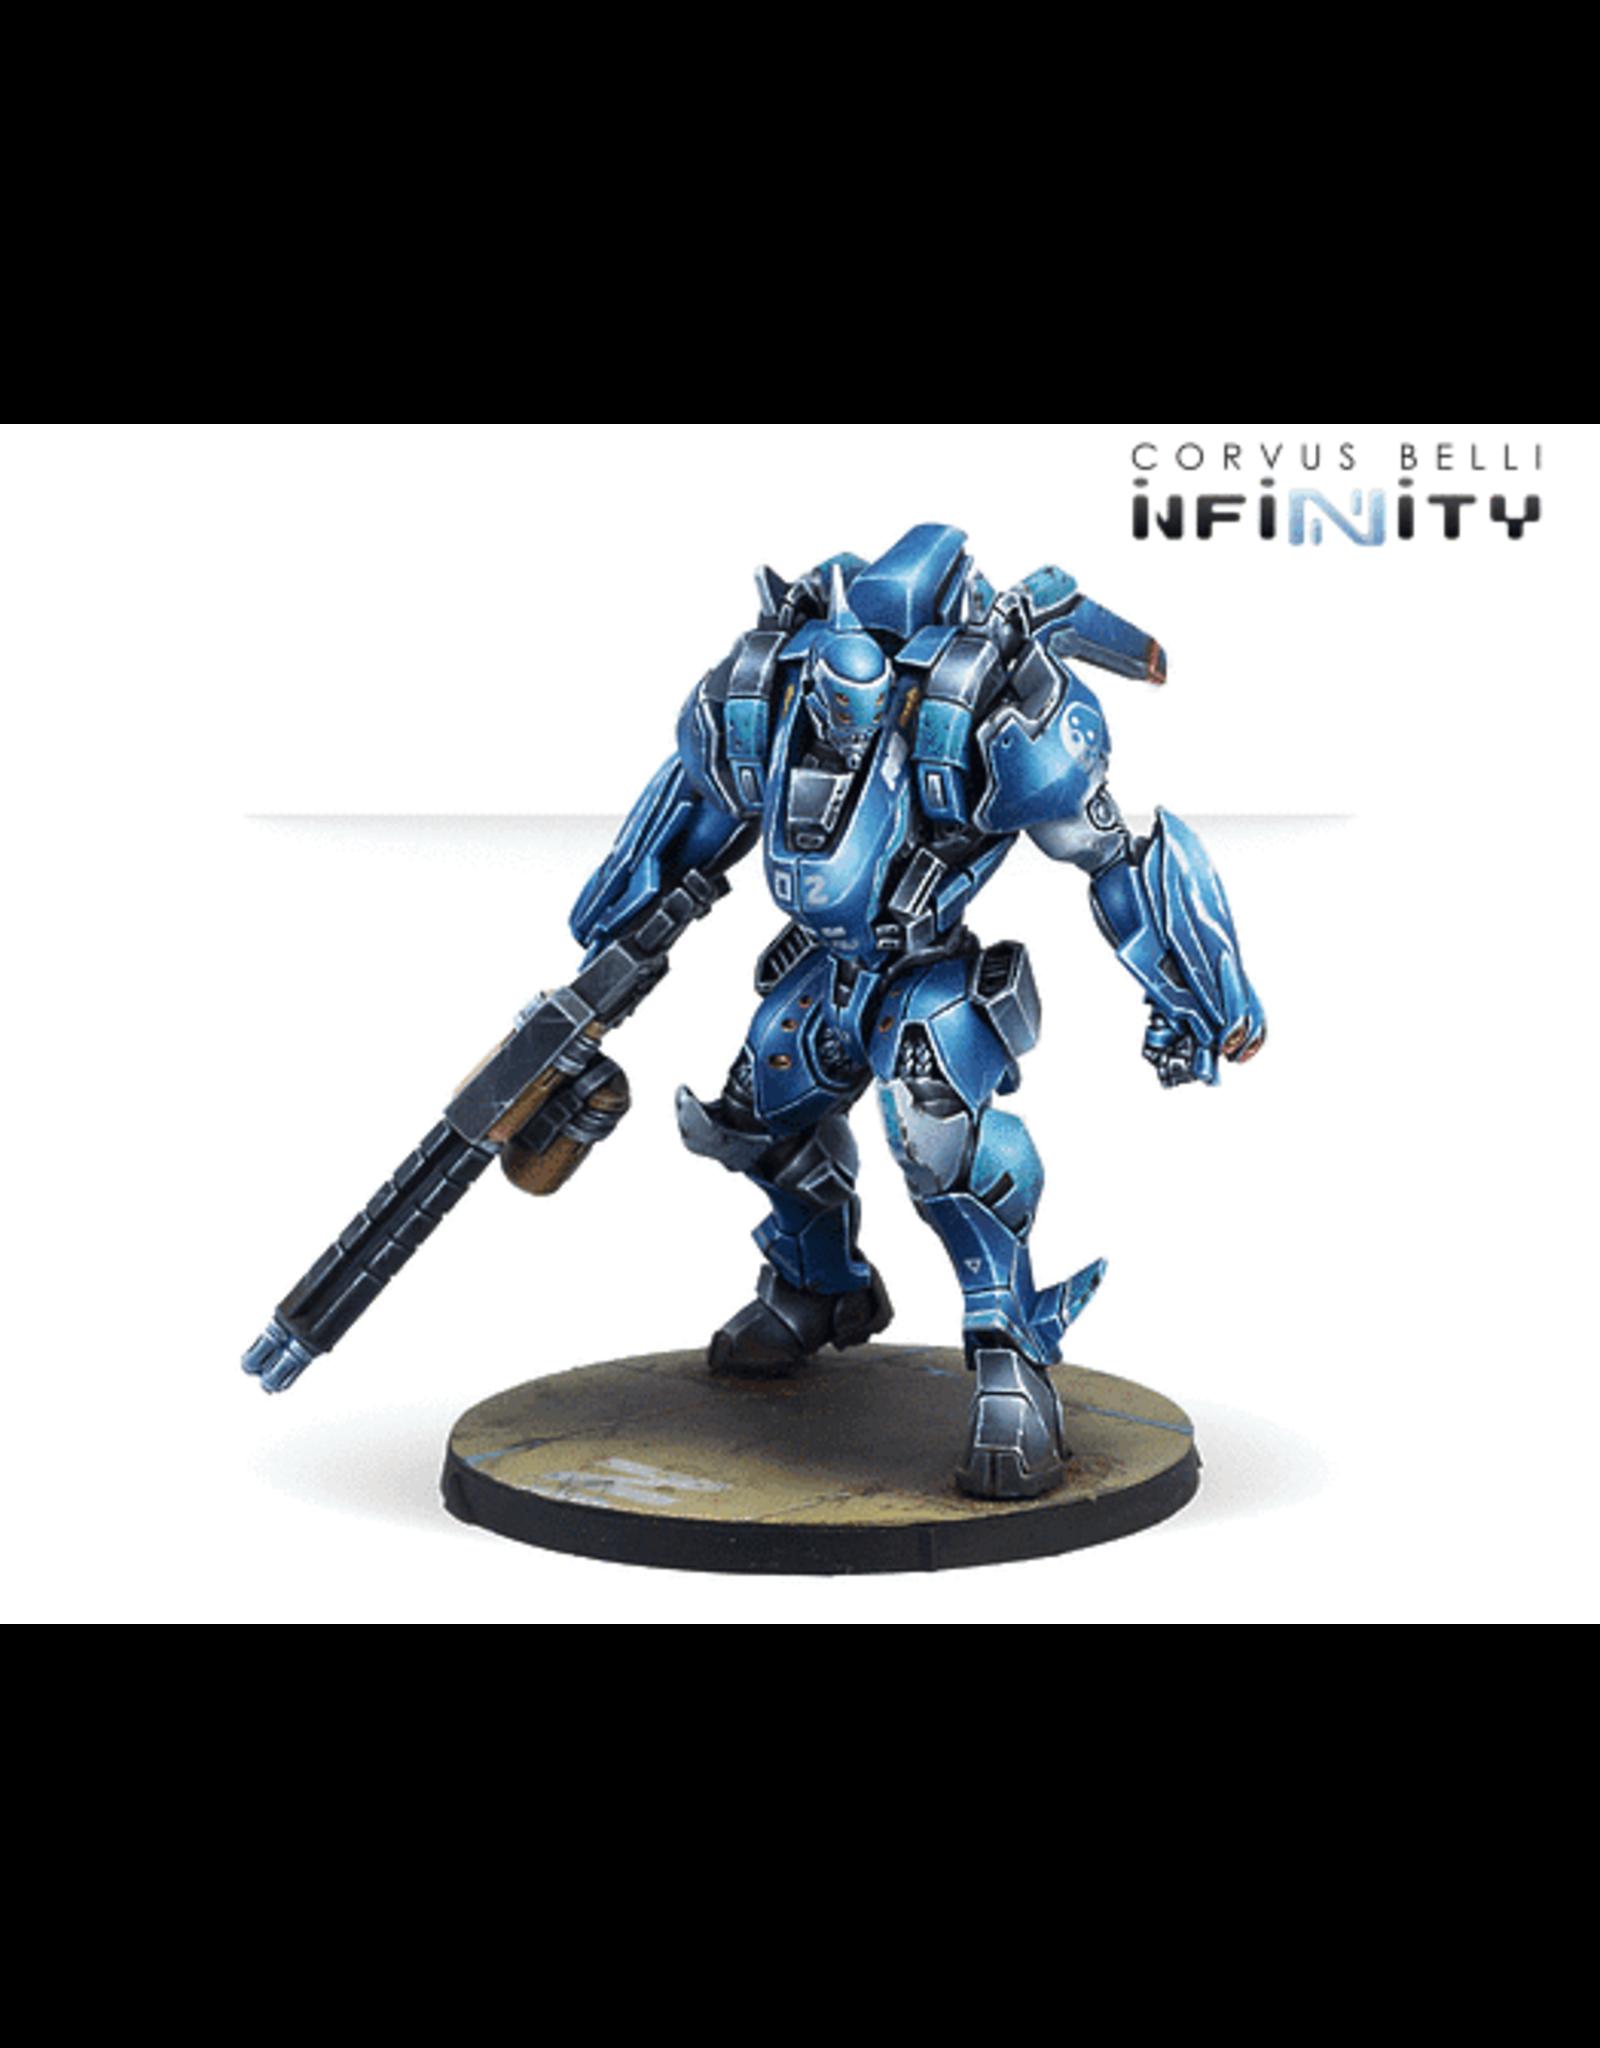 Corvus Belli Infinity: Pan-O Cutter